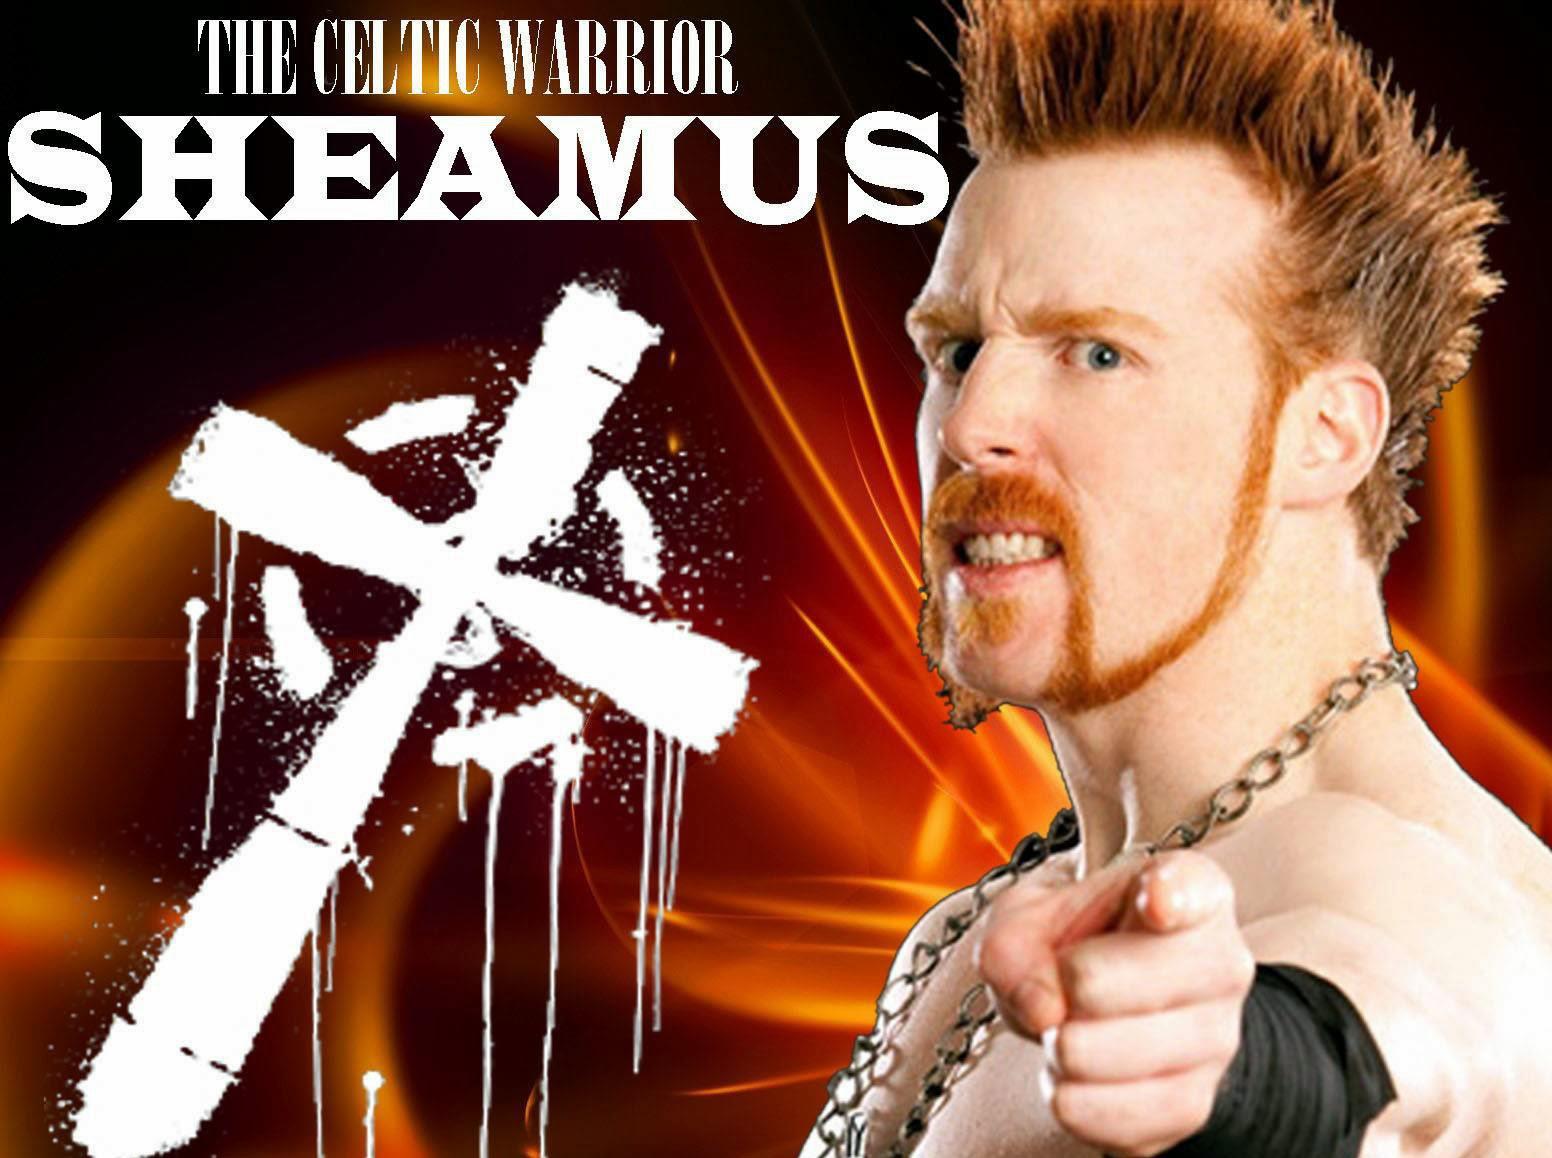 Kane Wwe Latest Hd Wallpaper 2013 14: Sheamus WWE New HD Wallpapers 2013-14